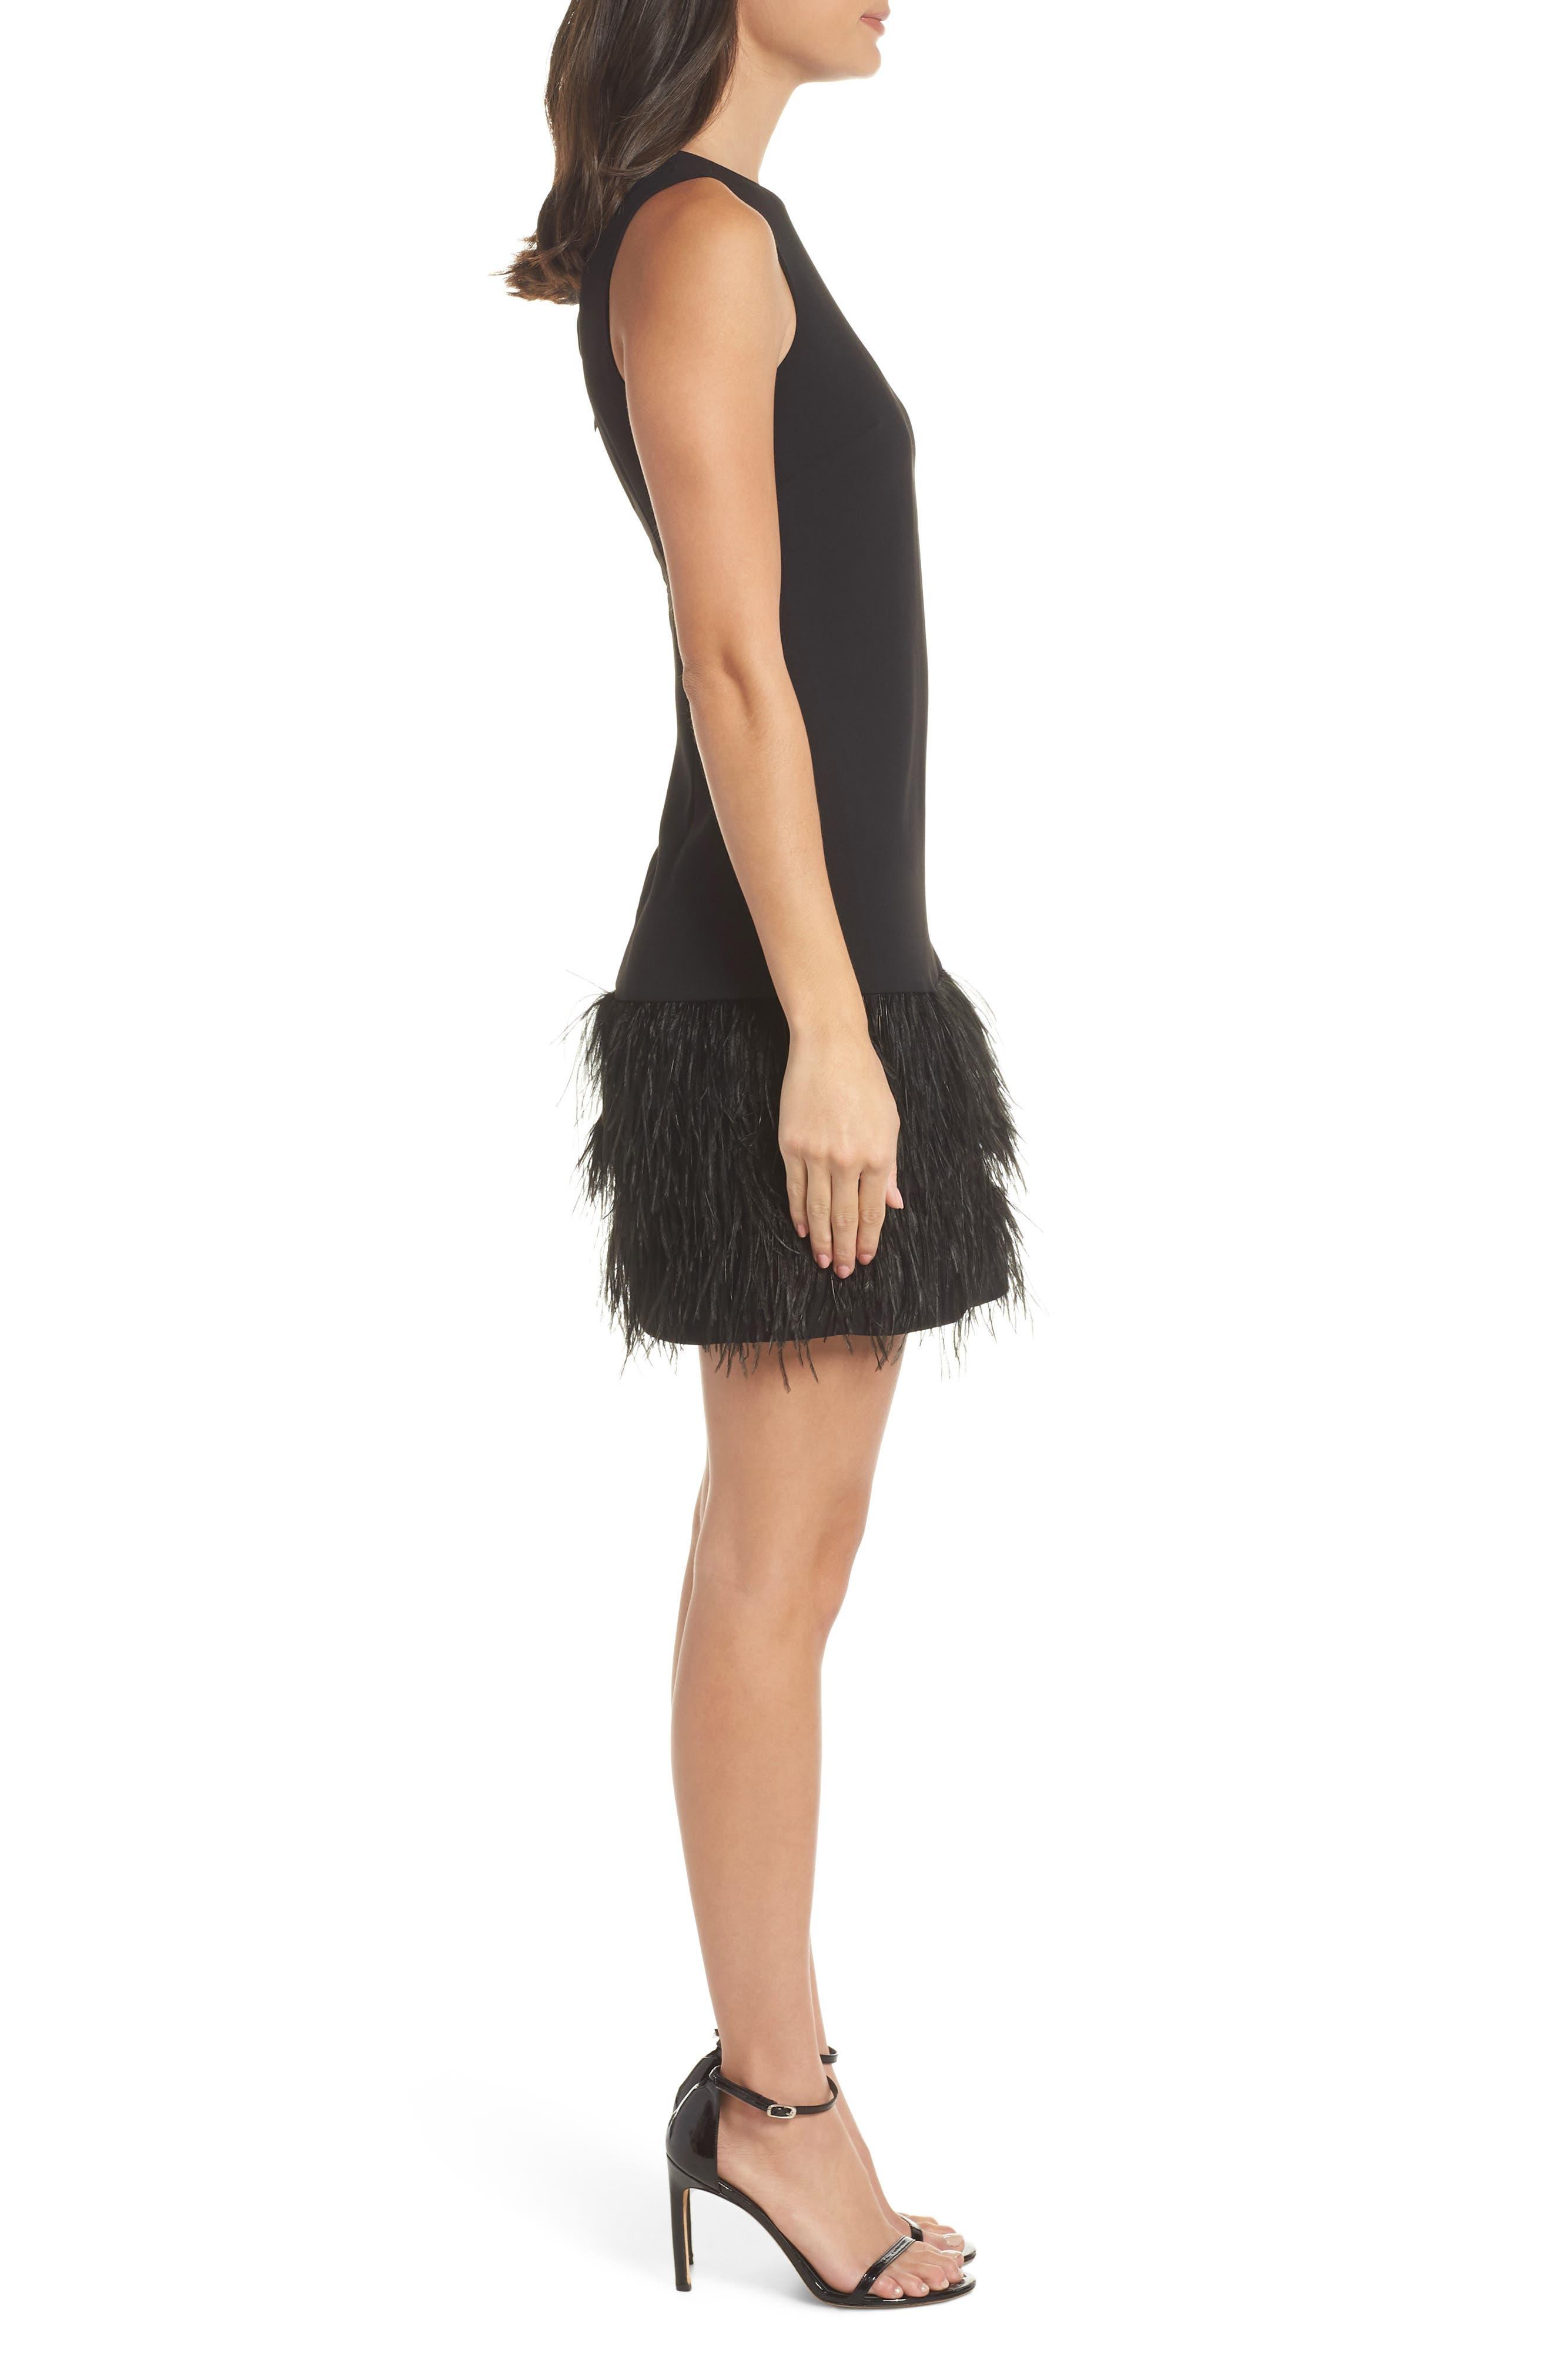 SAM EDELMAN, Feather Hem Sheath Dress, Alternate thumbnail 4, color, BLACK